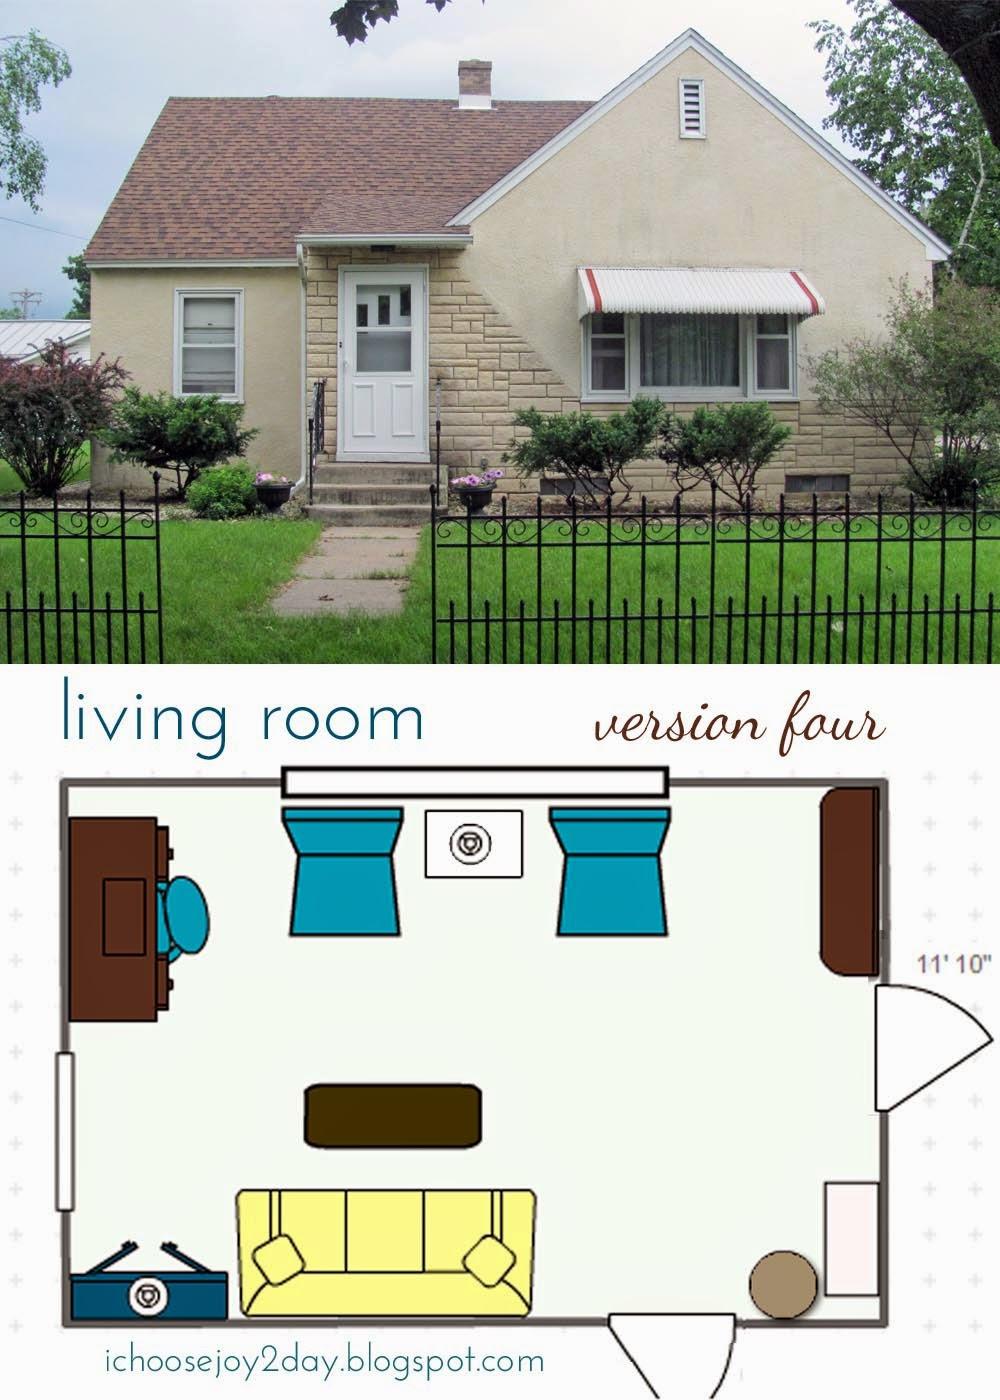 http://ichoosejoy2day.blogspot.com/2014/10/living-room-how-we-live-version-4.html